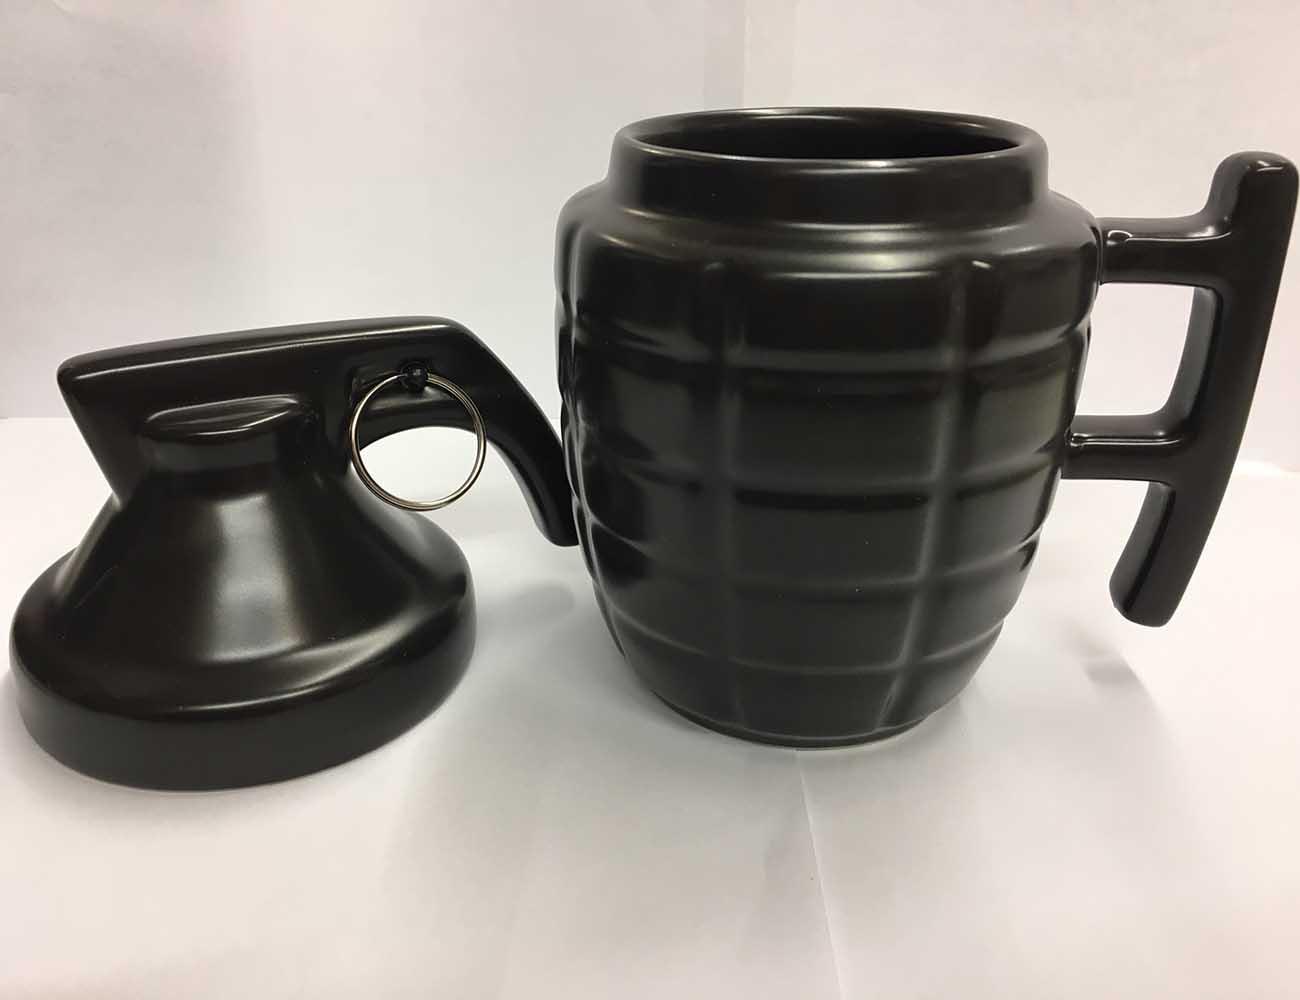 Grenade Mug – Replicating the Grenade Design on Your Coffee Mug